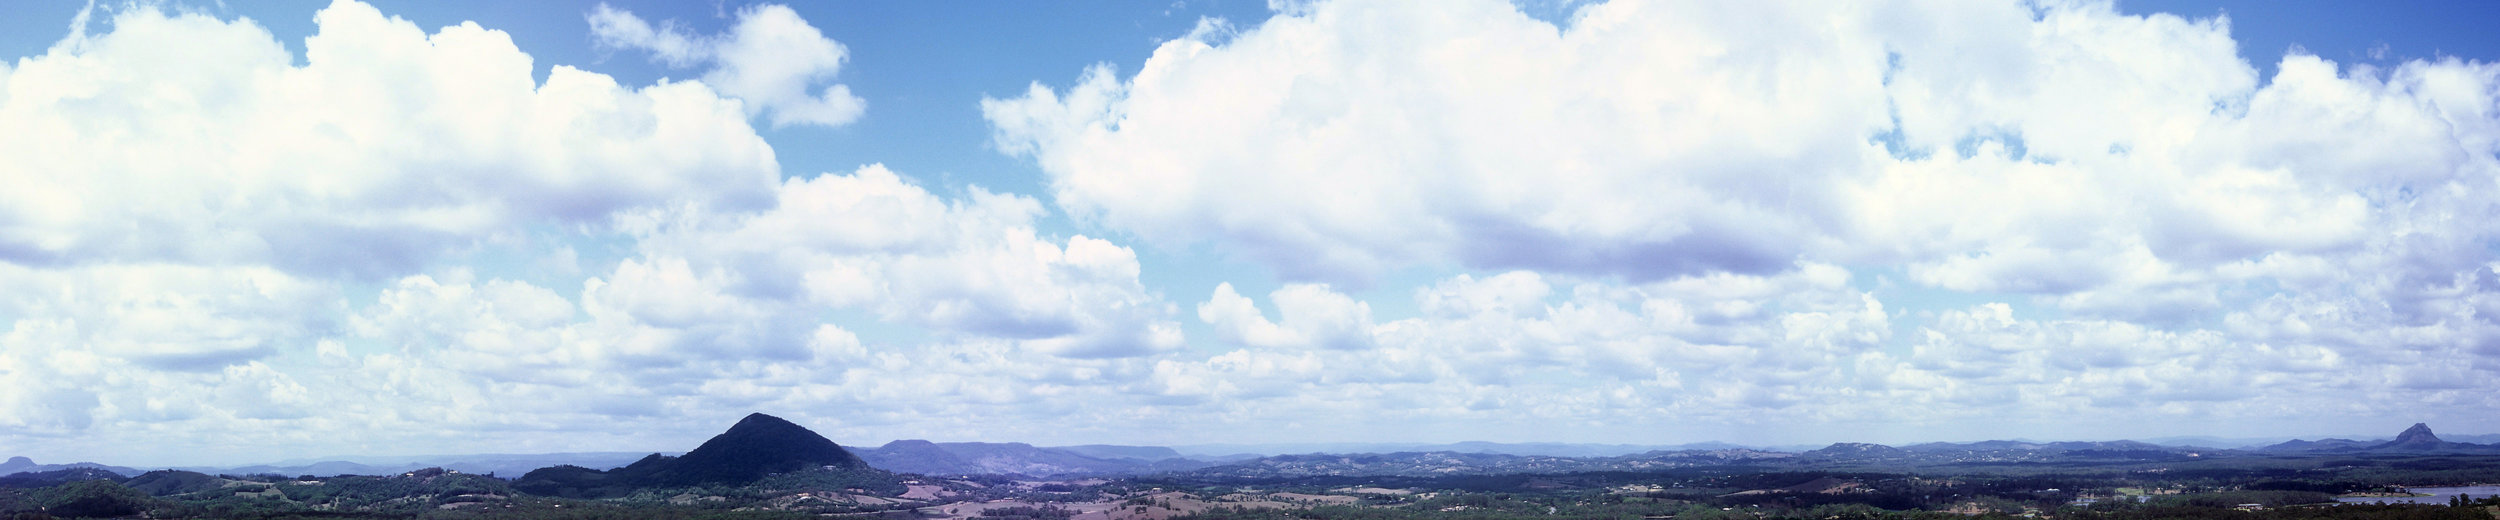 From Mt Tinbeerwah Lookout, Noosa Sunshine Coast Qld Australia